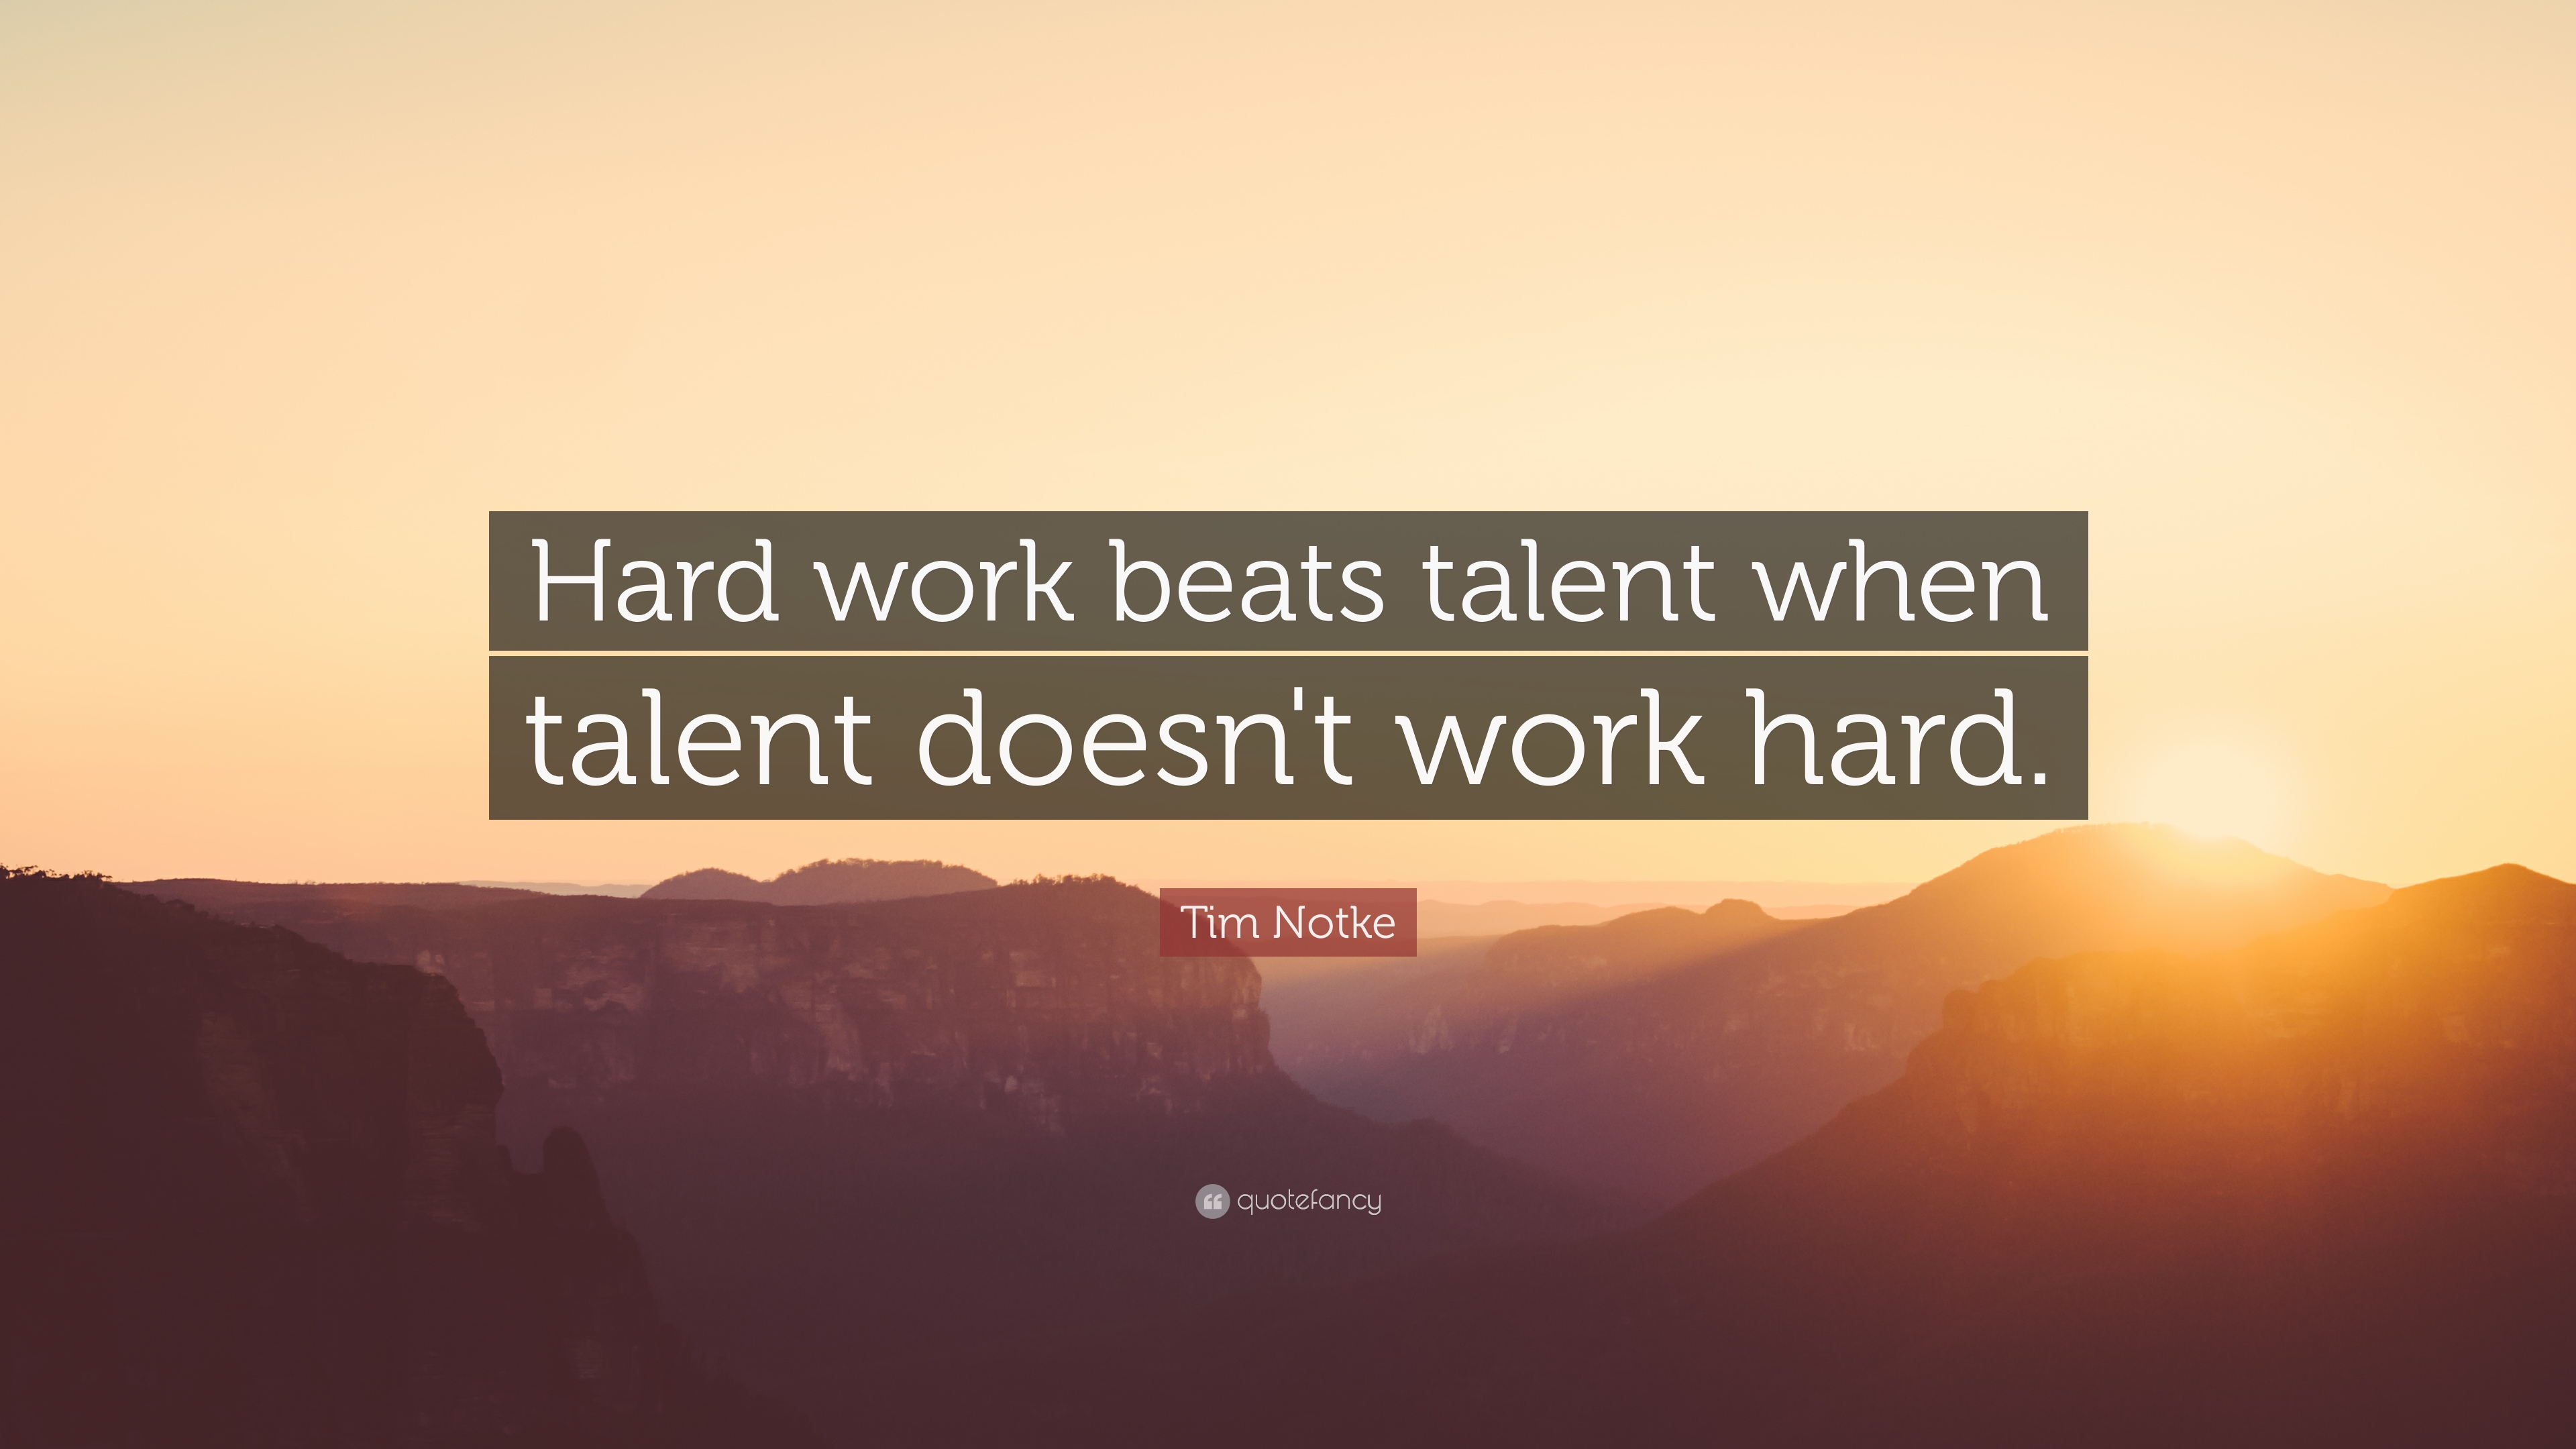 Motivational Quotes Hard Work Beats Talent When Talent